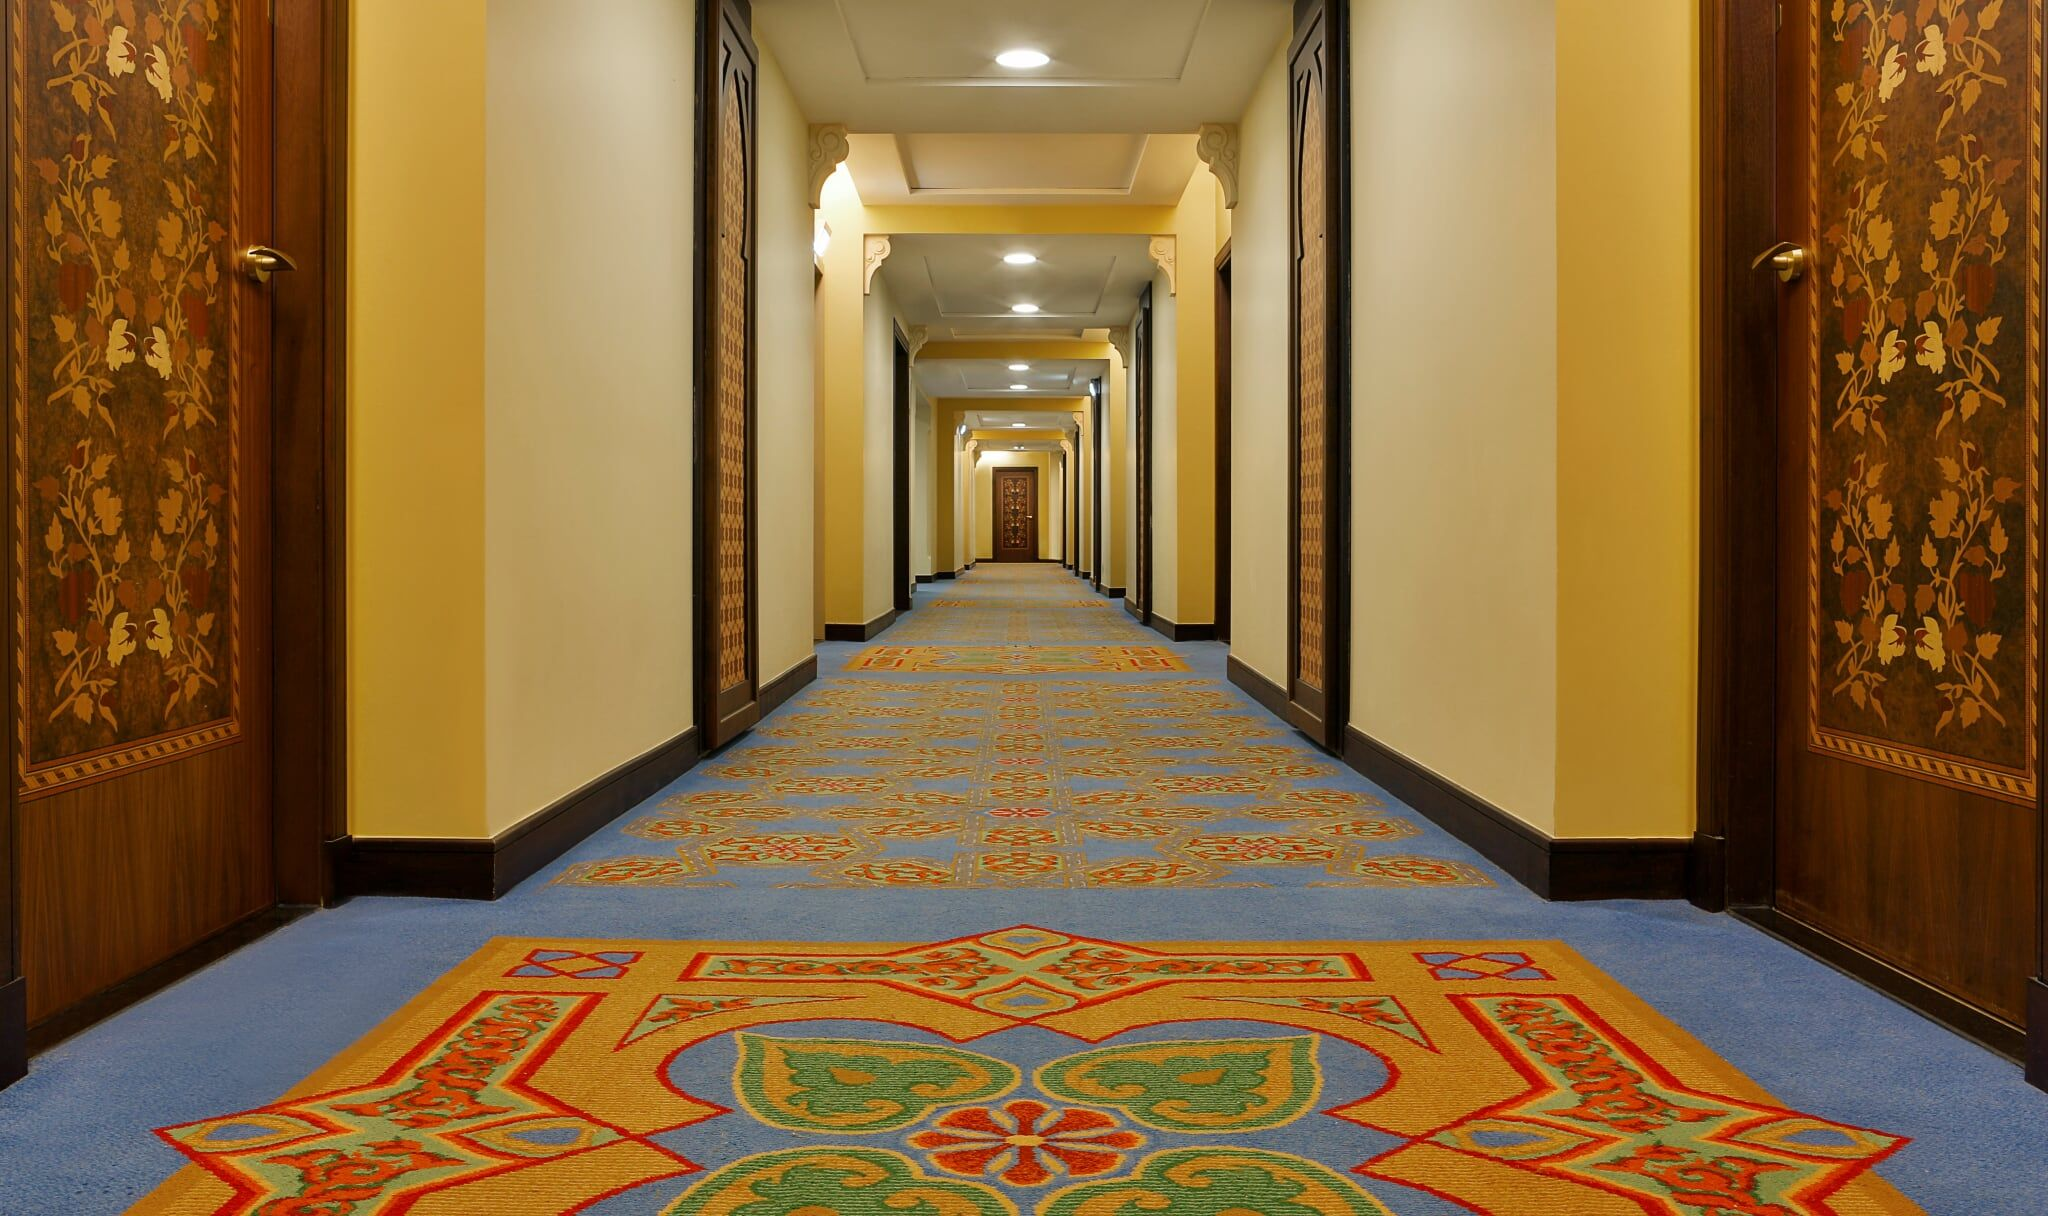 Hotel Corridors Anjum Hotel Makkah Hotel Luxury Hotel